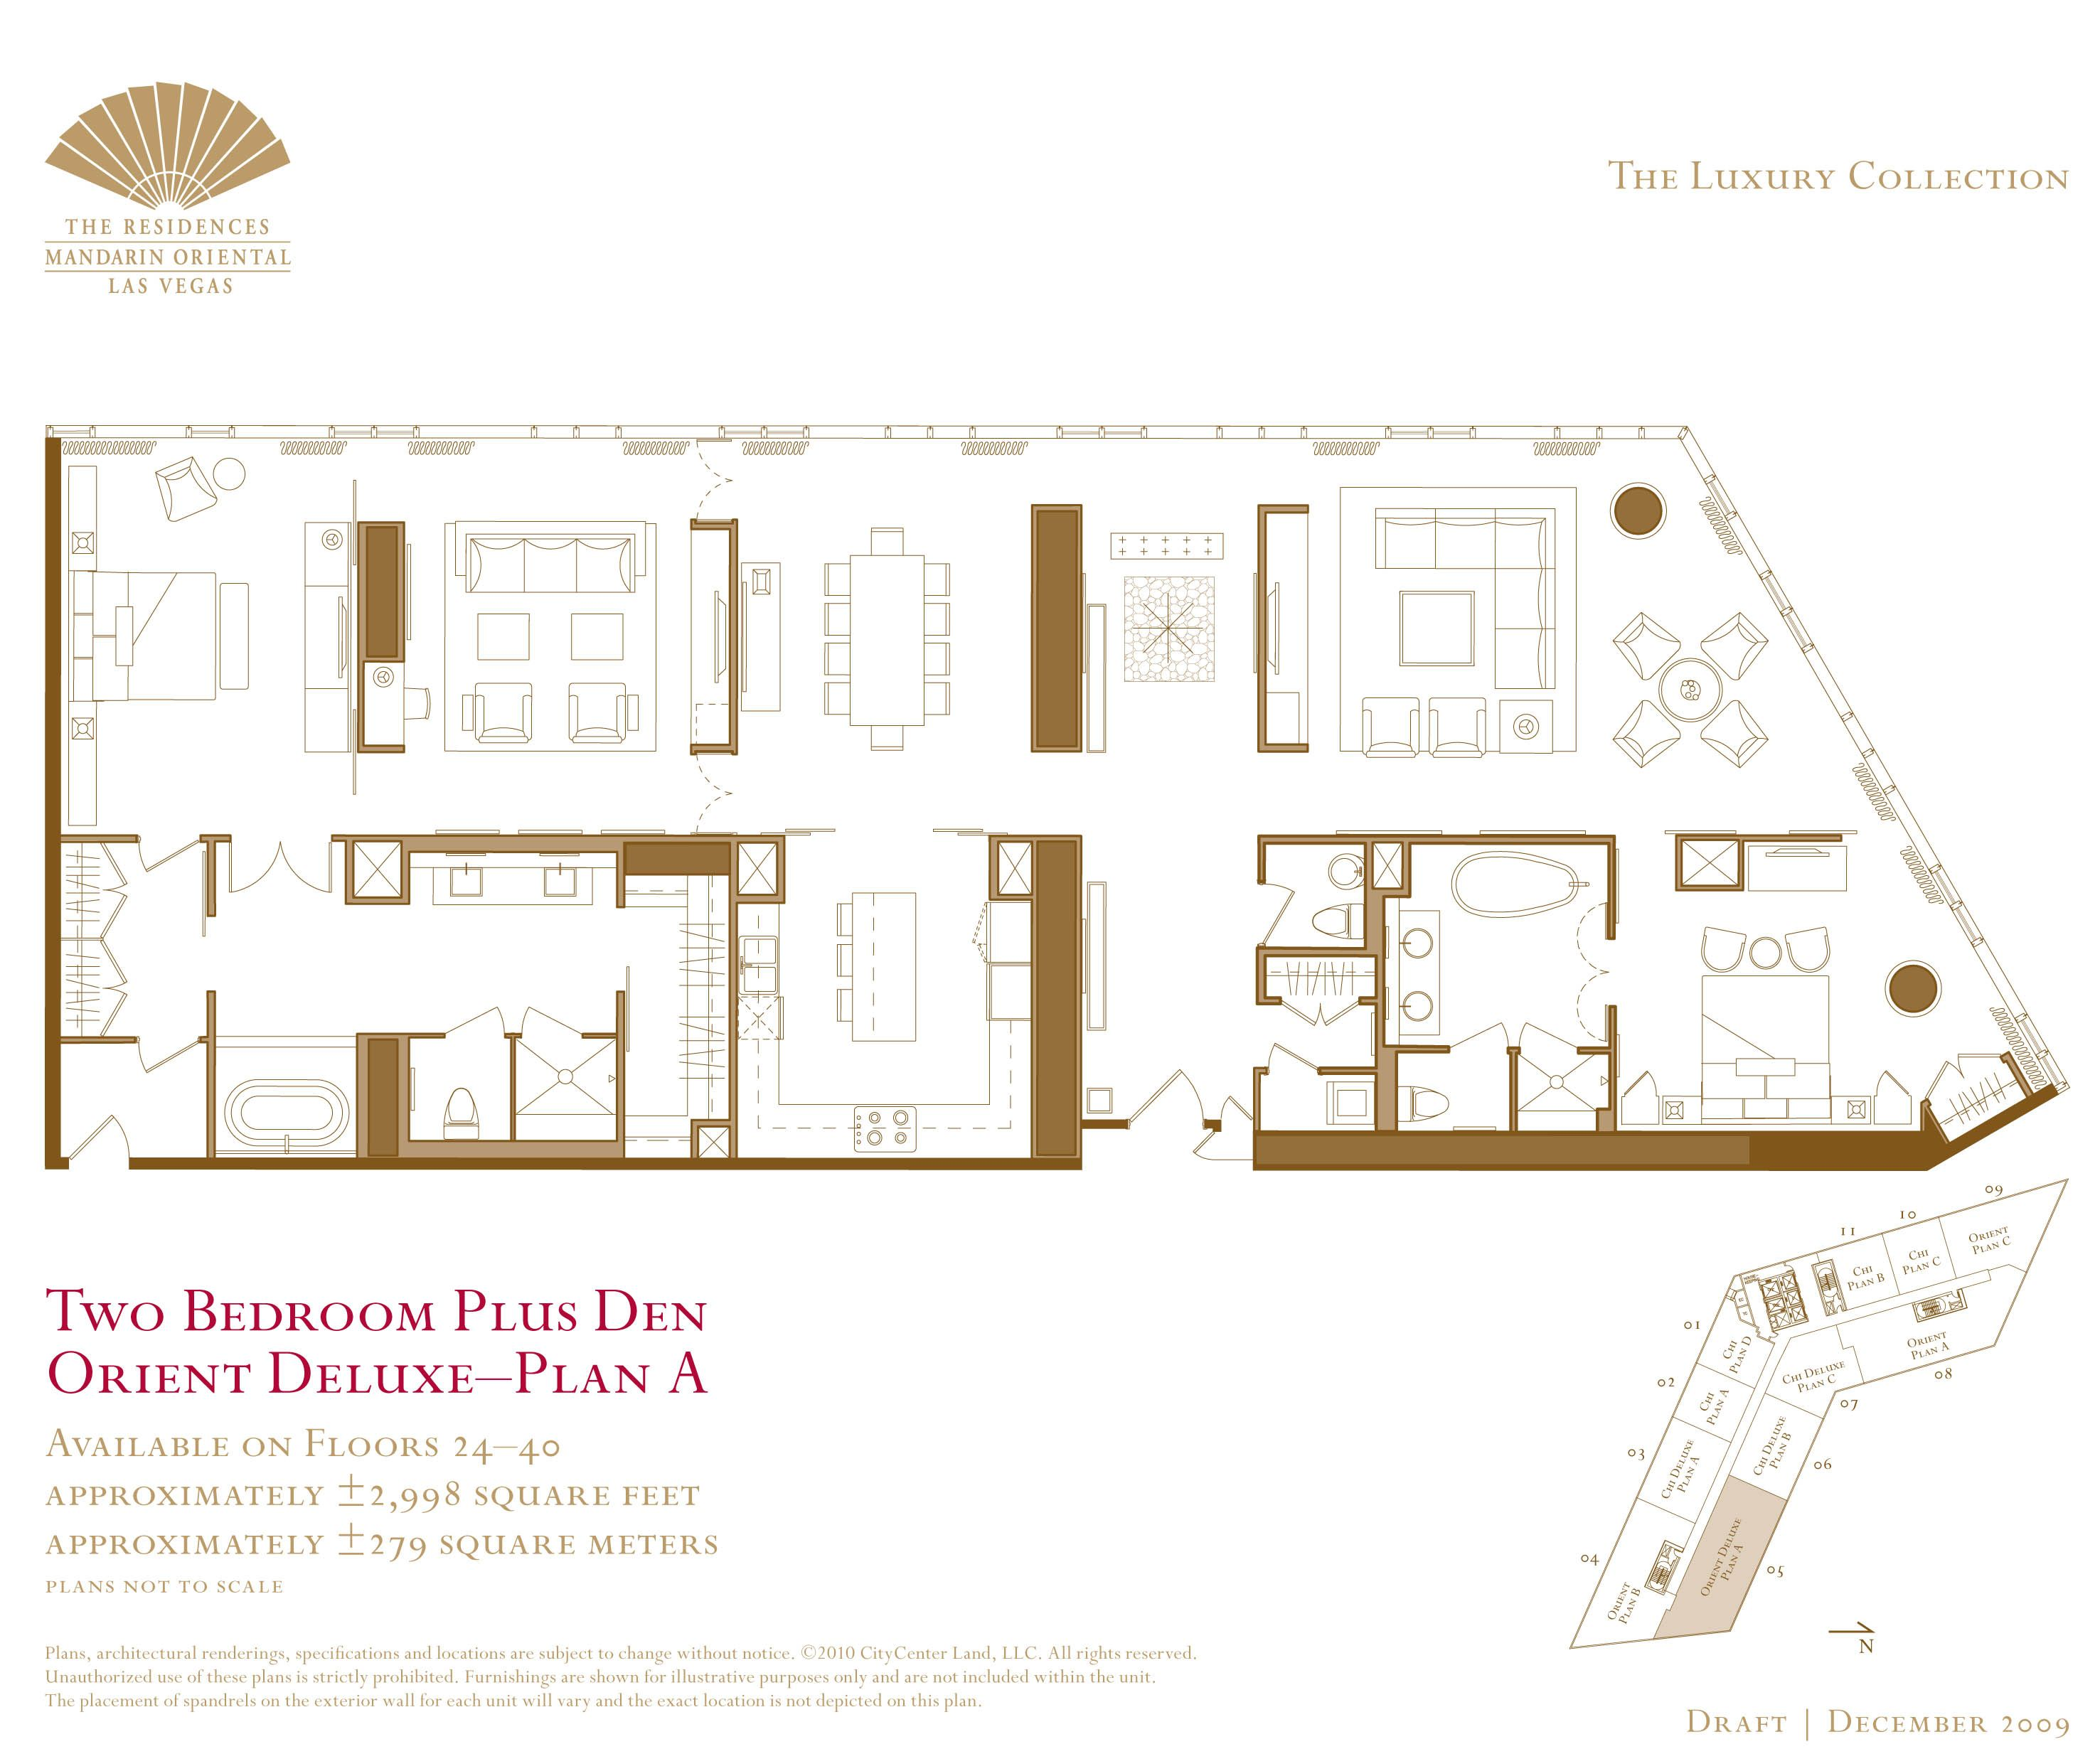 Resultado De Imagem Para Mandarin Oriental Plan  Hotel Plan New 2 Bedroom Suites Las Vegas Strip 2018